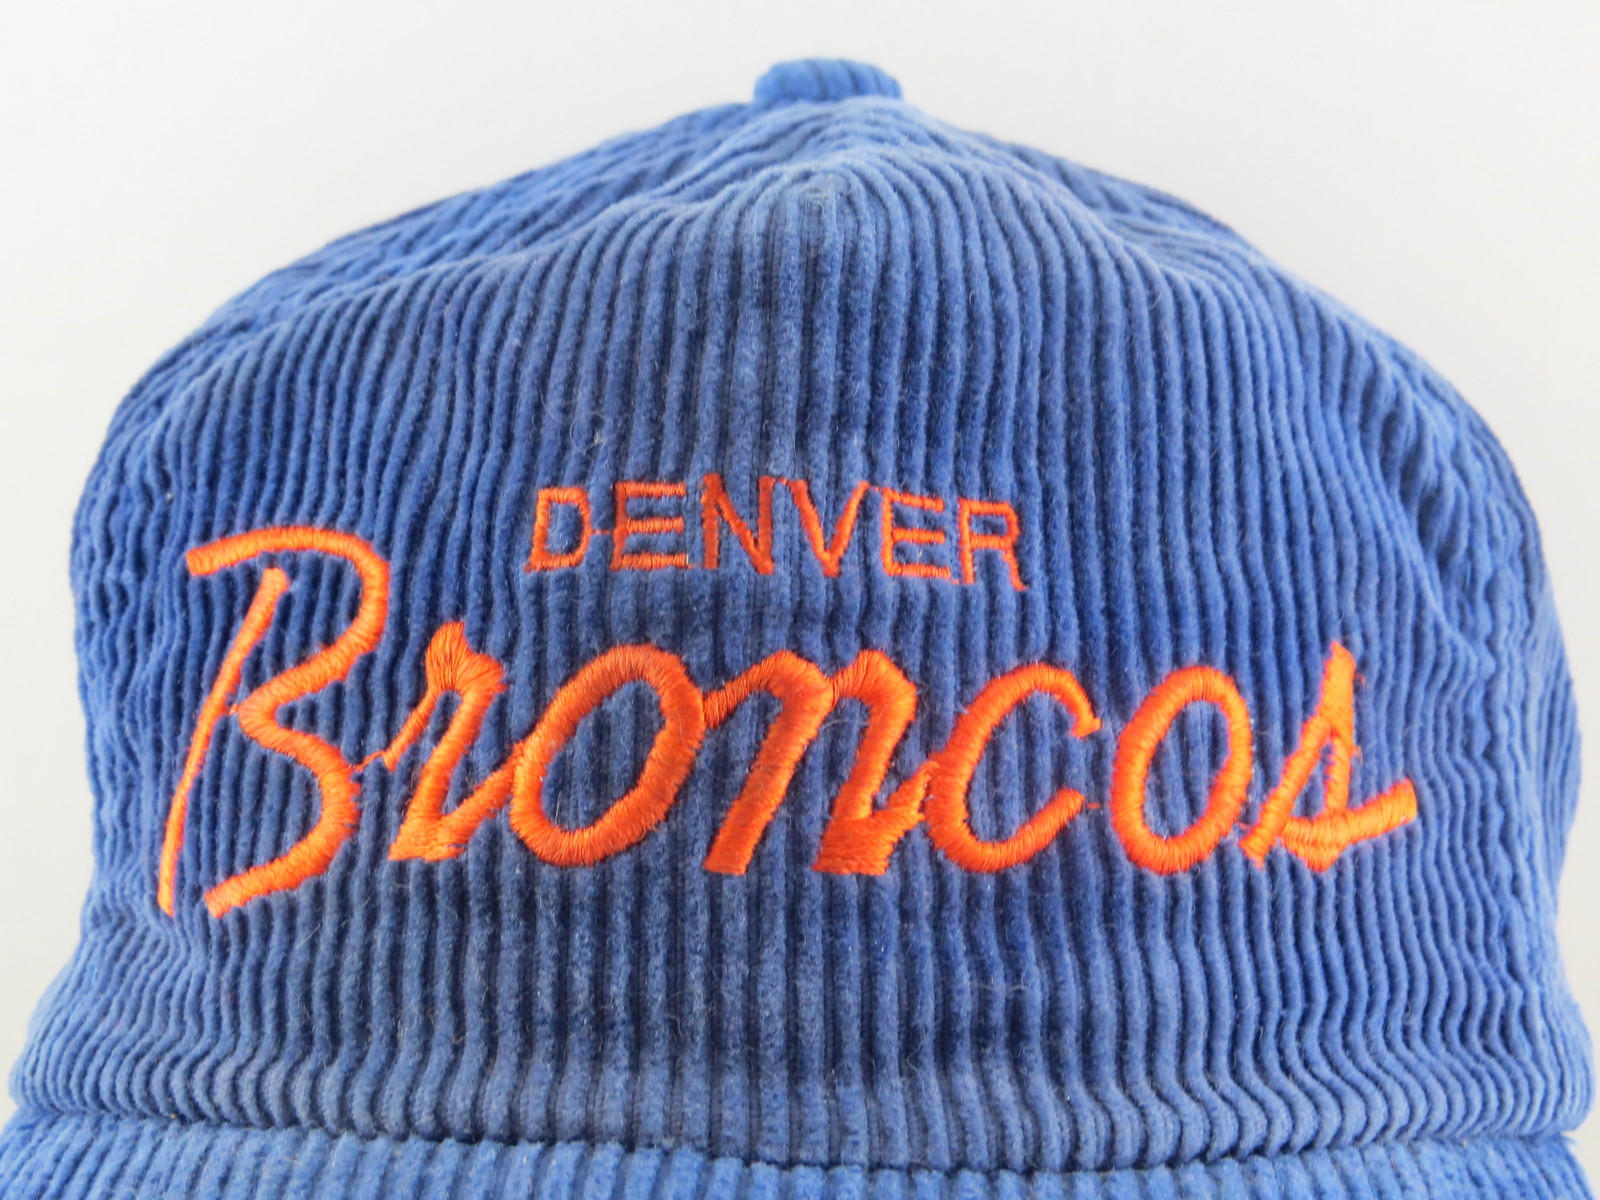 Denver Broncos Hat (VTG) - Corduroy Script Sports Specialties - Adutl Snapback